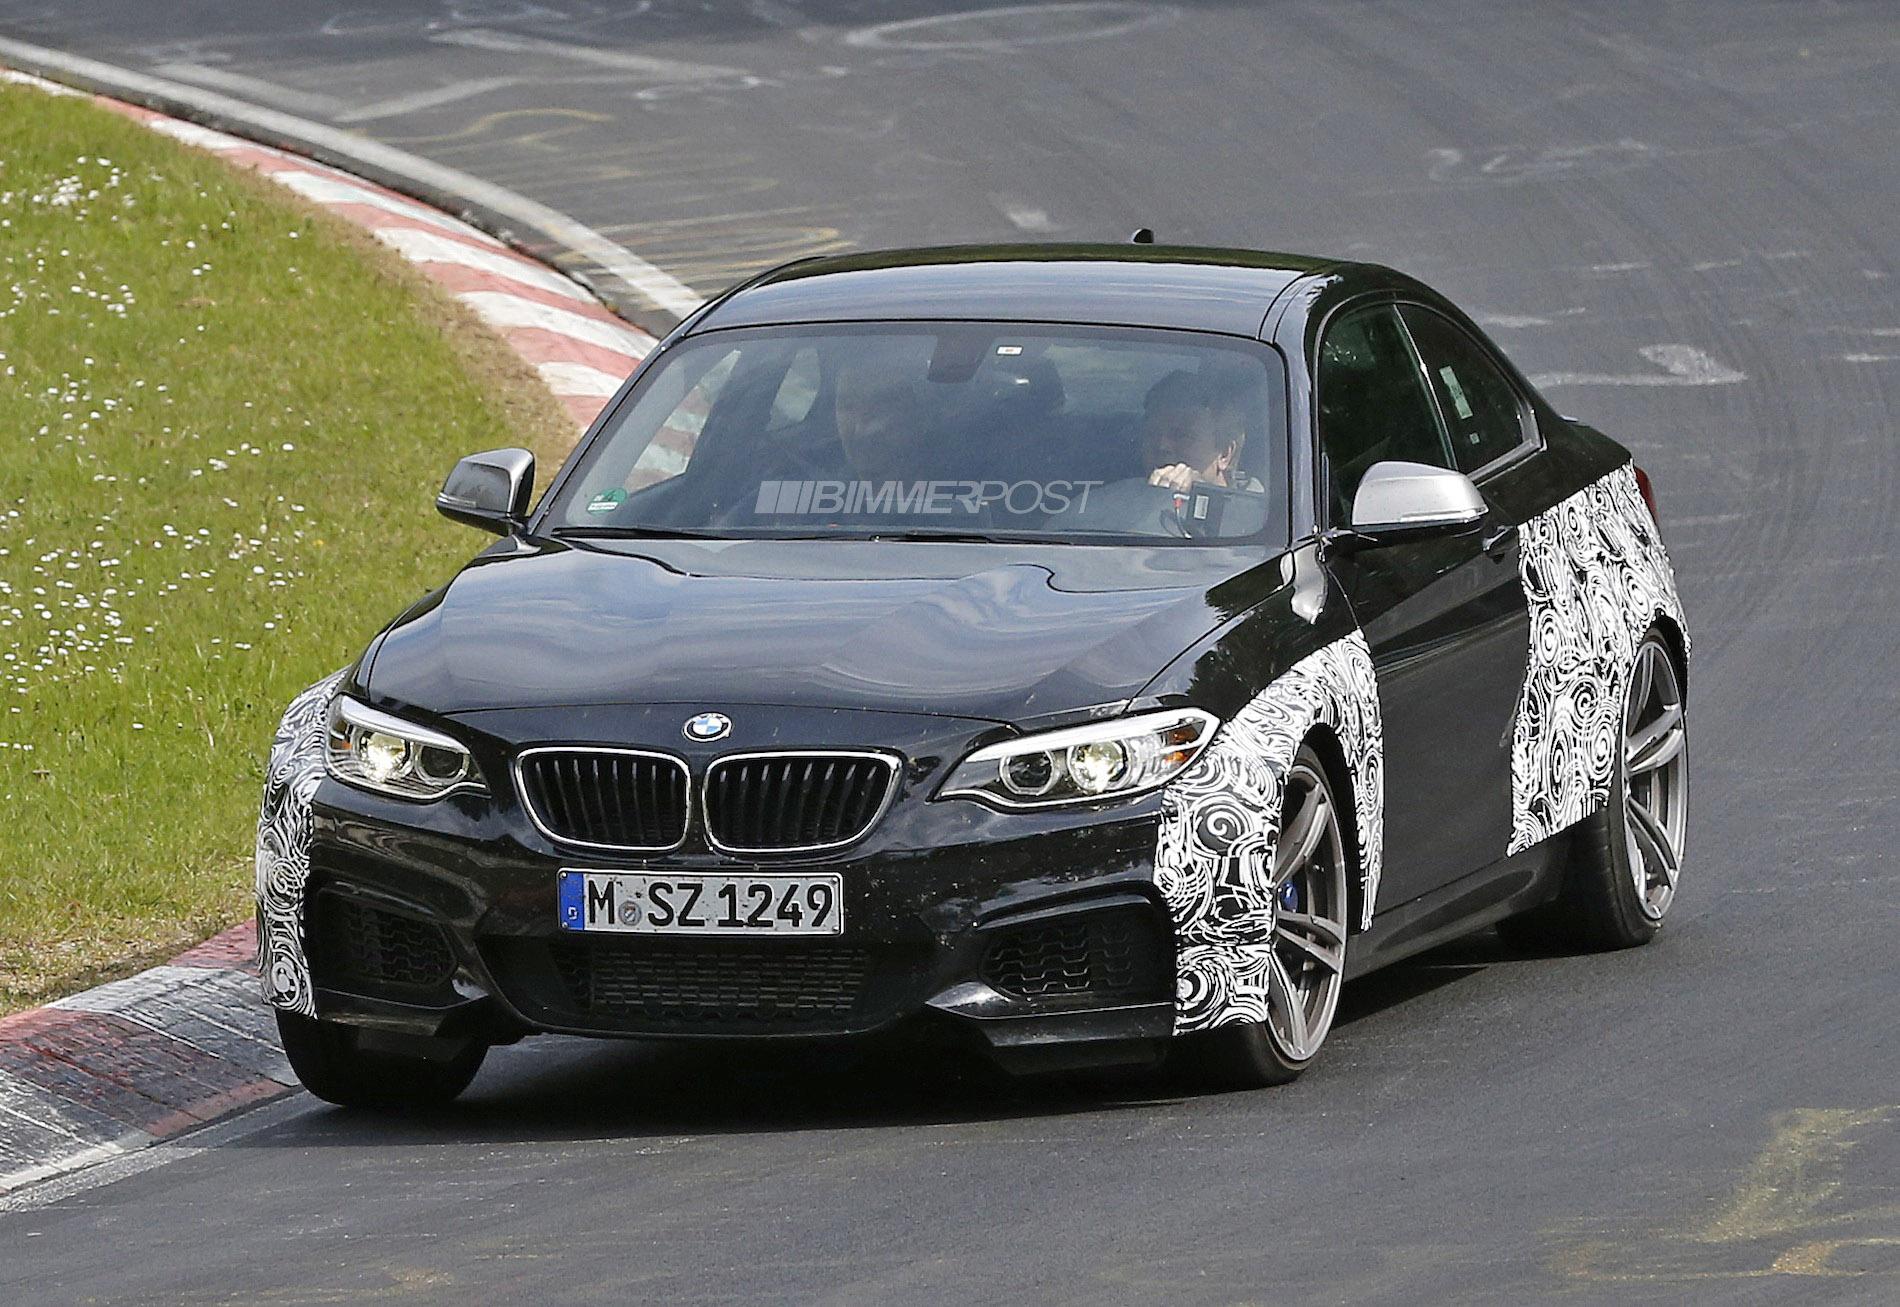 2016 - [BMW] M2 [F87] - Page 3 M2%20Ring%201